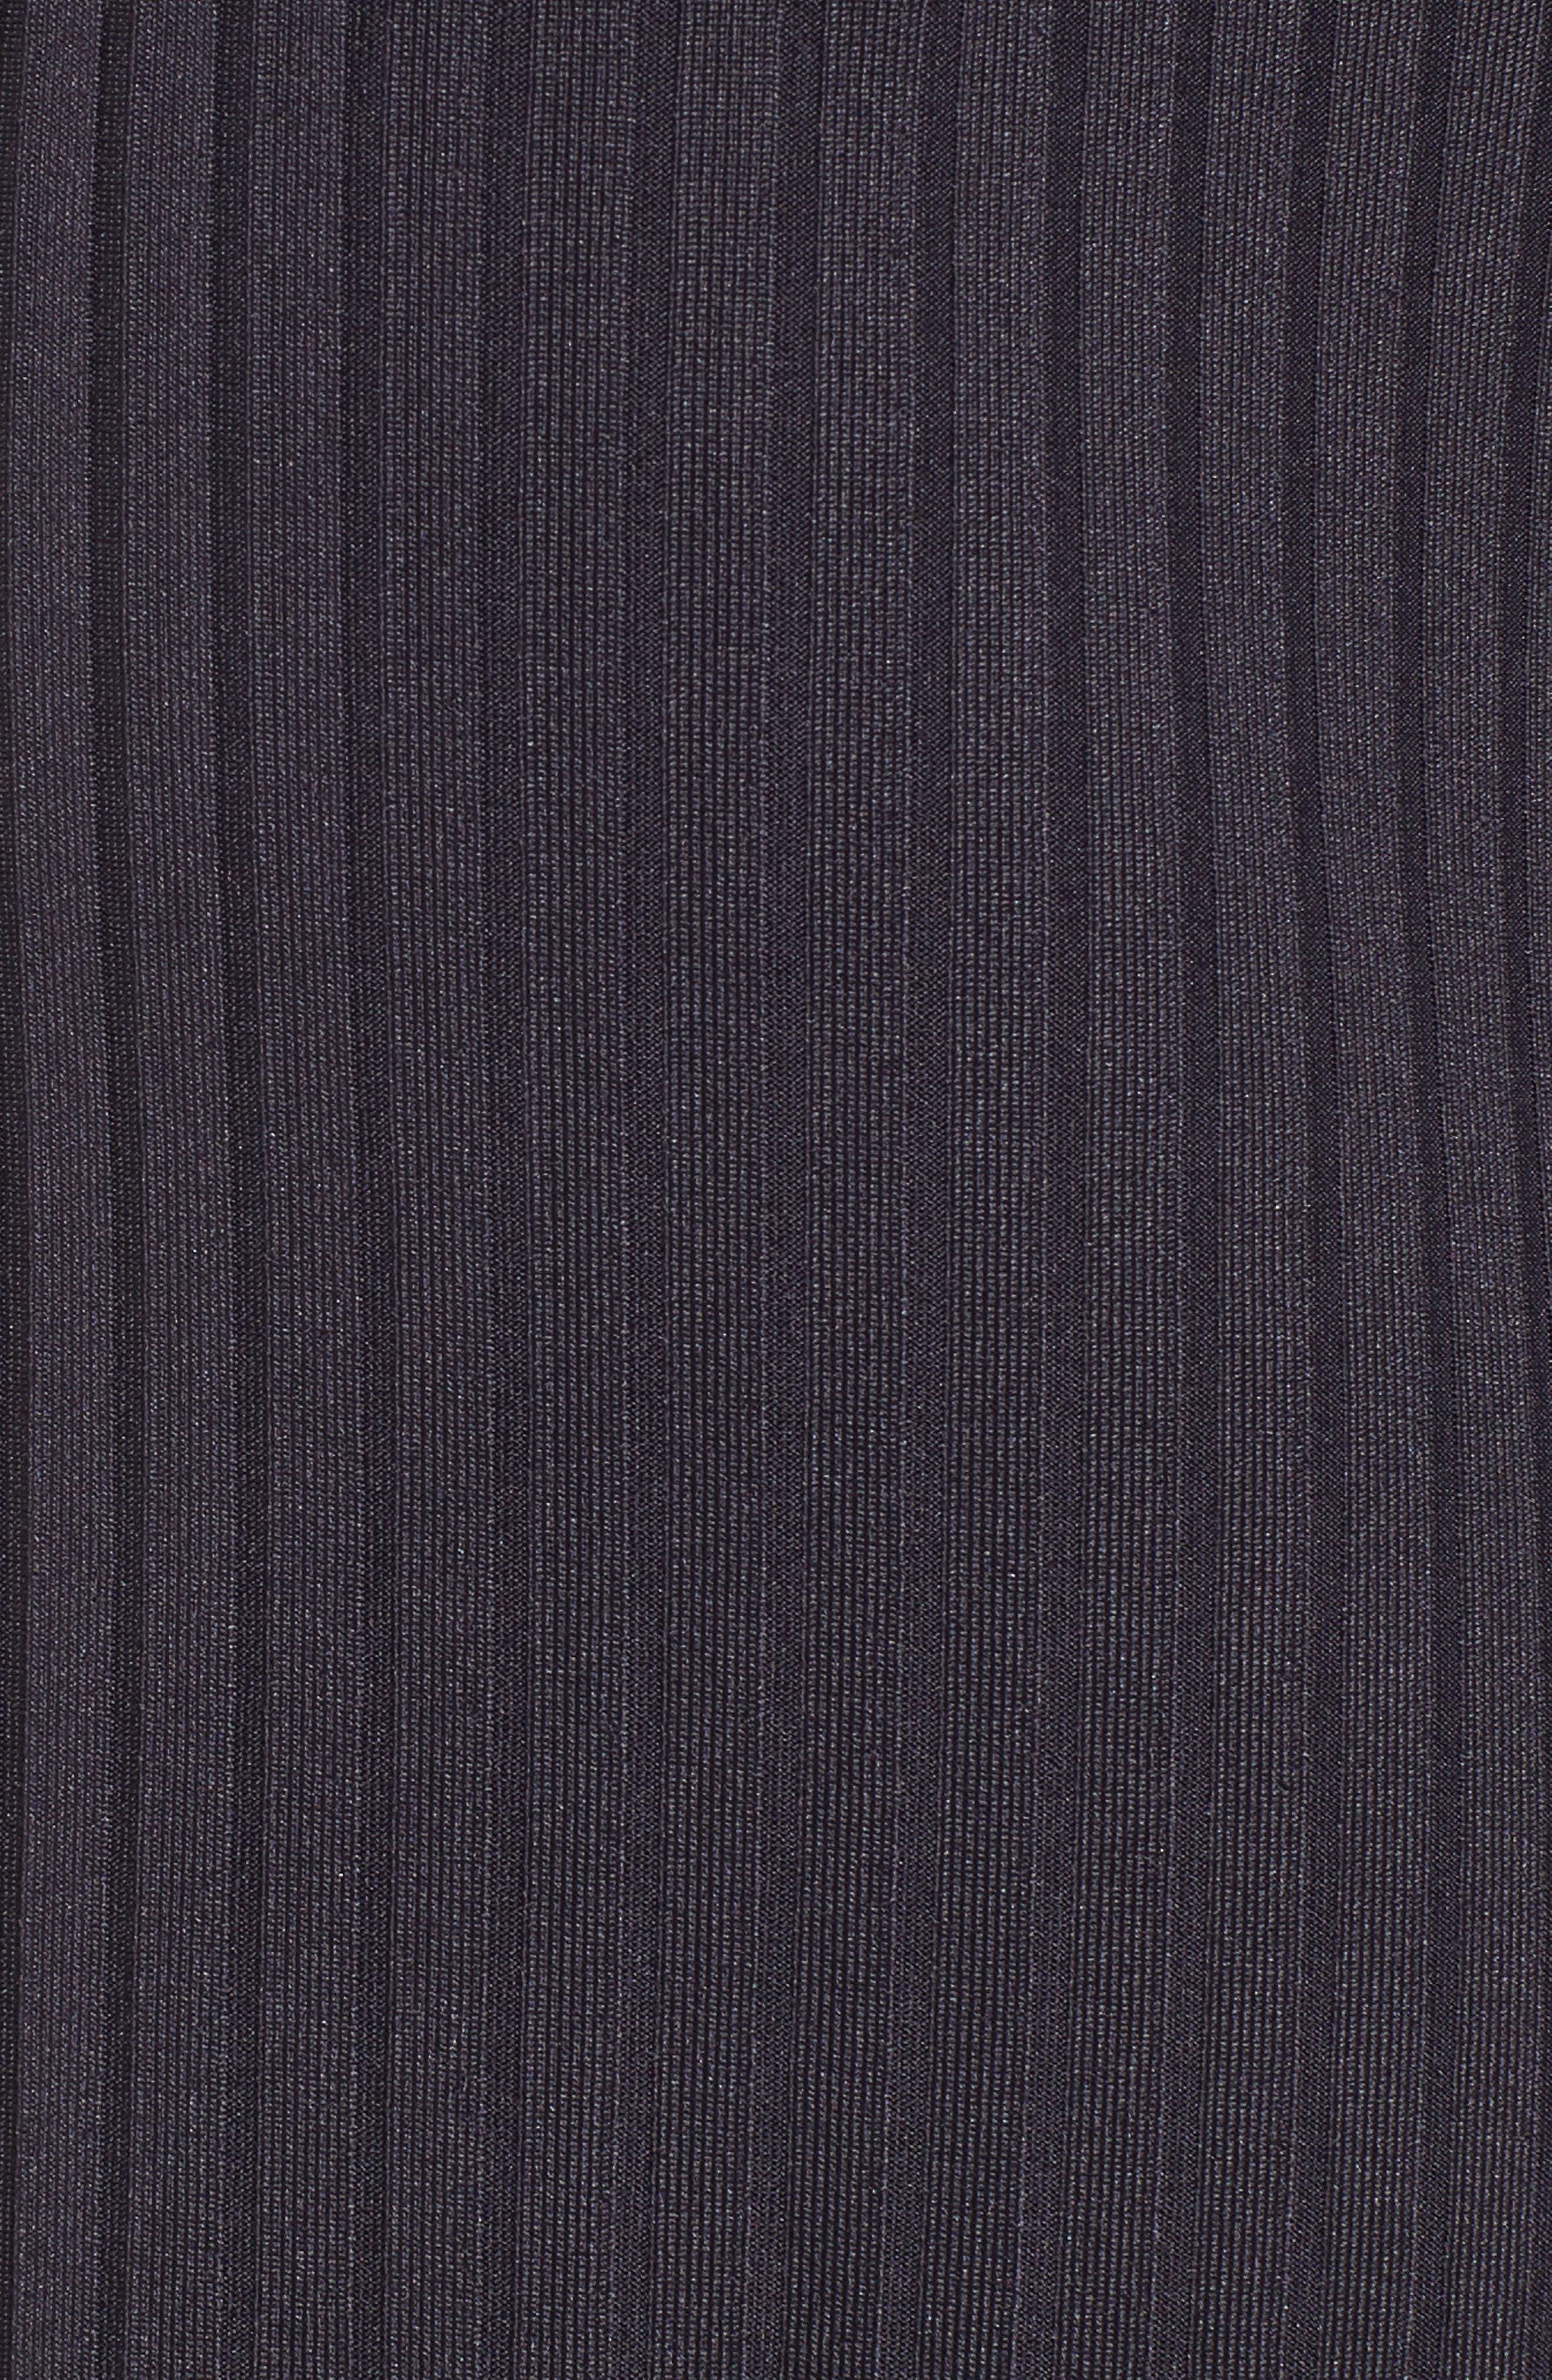 Jefferson Cropped Pant,                             Alternate thumbnail 5, color,                             Navy